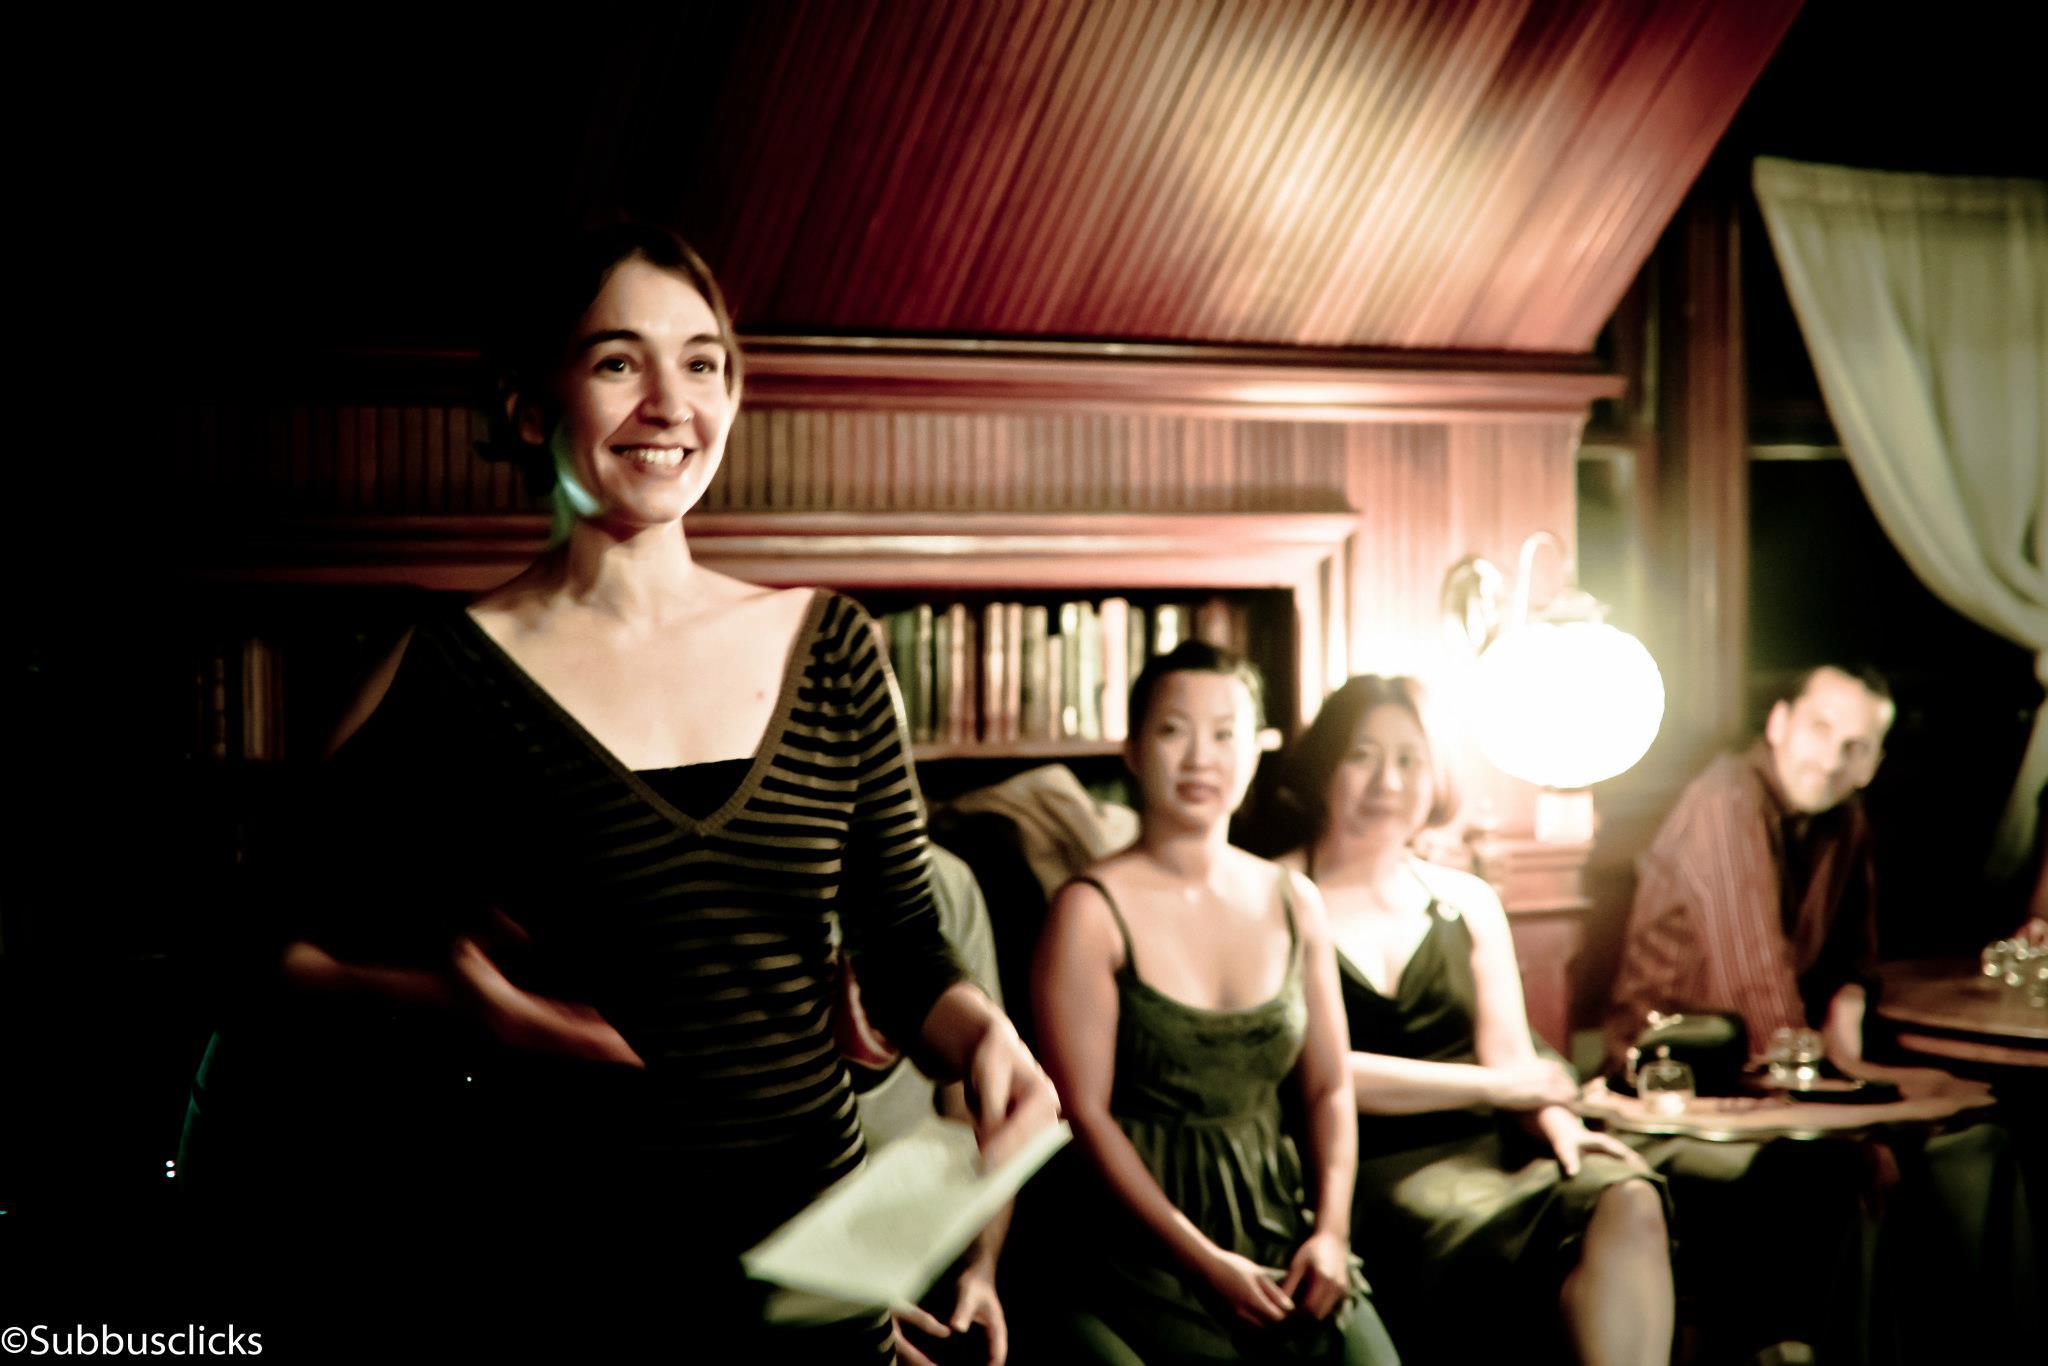 Photo at Weller House Inn by  SubbusClicks